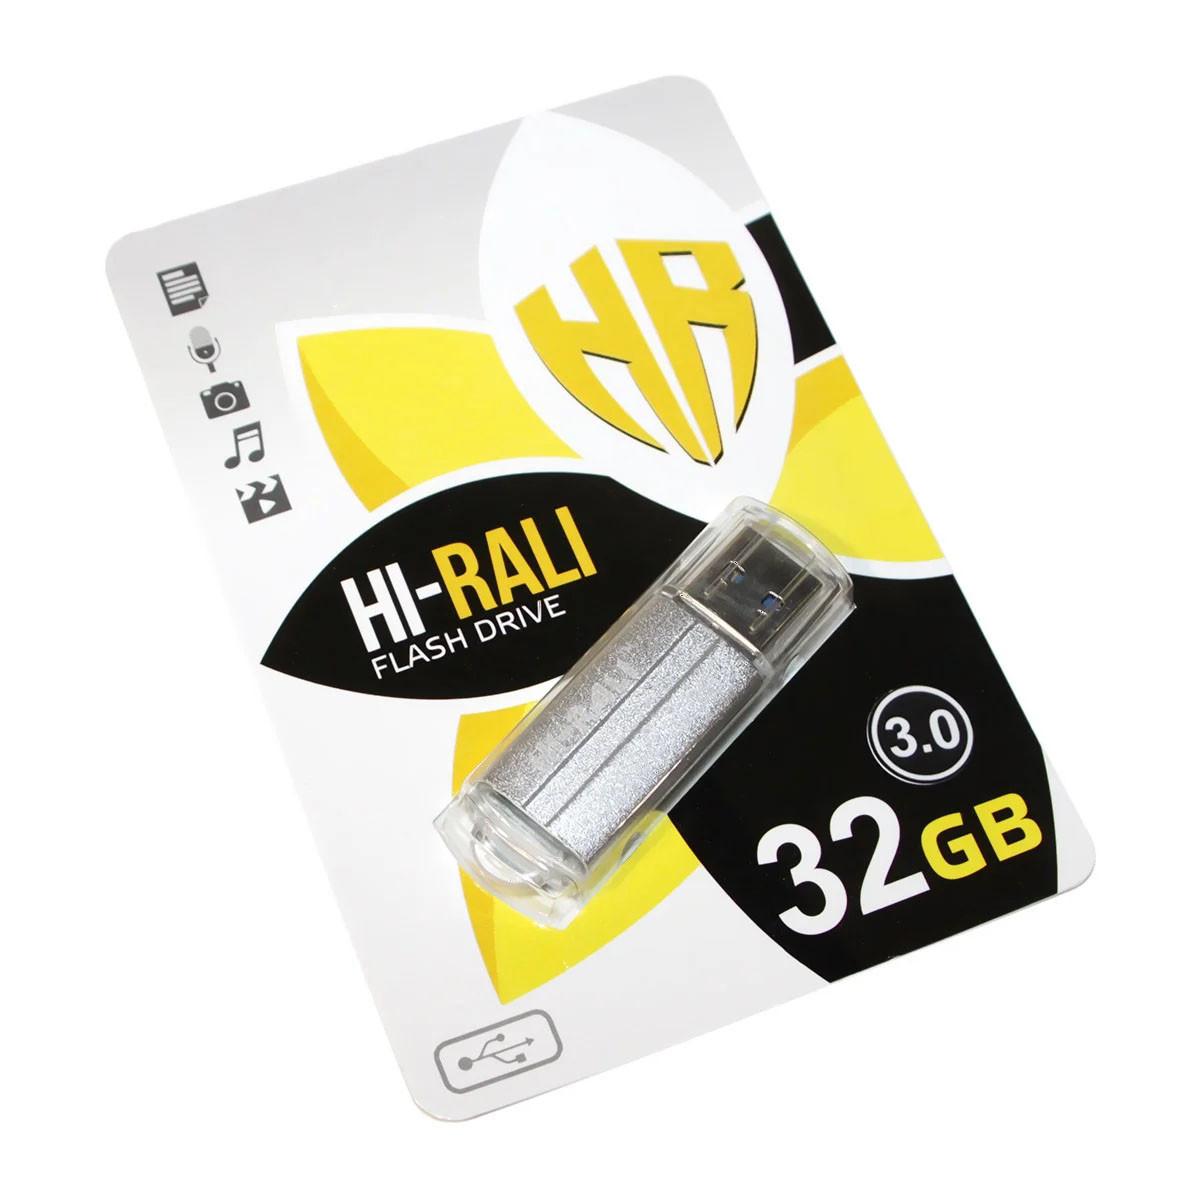 Флешка HI-RALI 32 ГБ Corsair series Silver